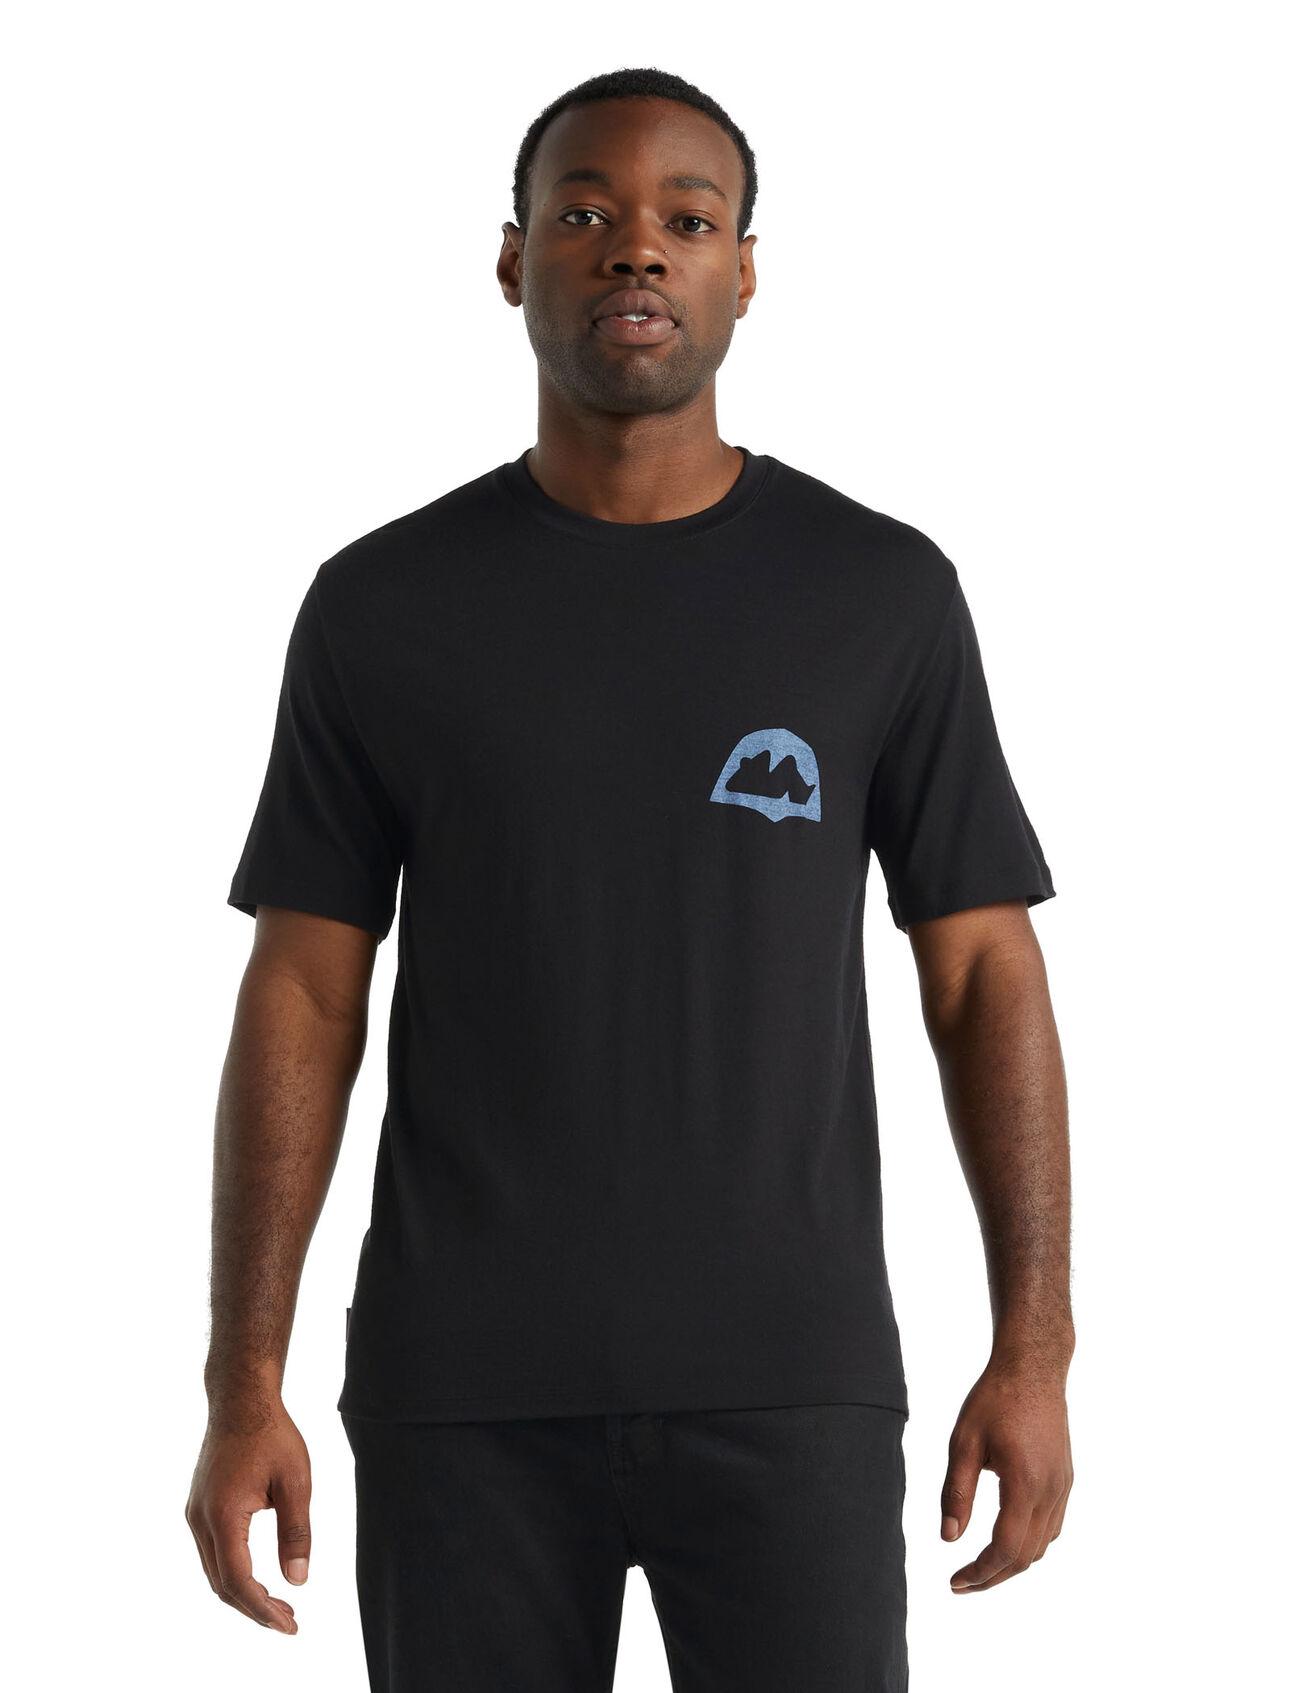 icebreaker x Antra Svarcs Merino Short Sleeve T-Shirt Moon Reflection